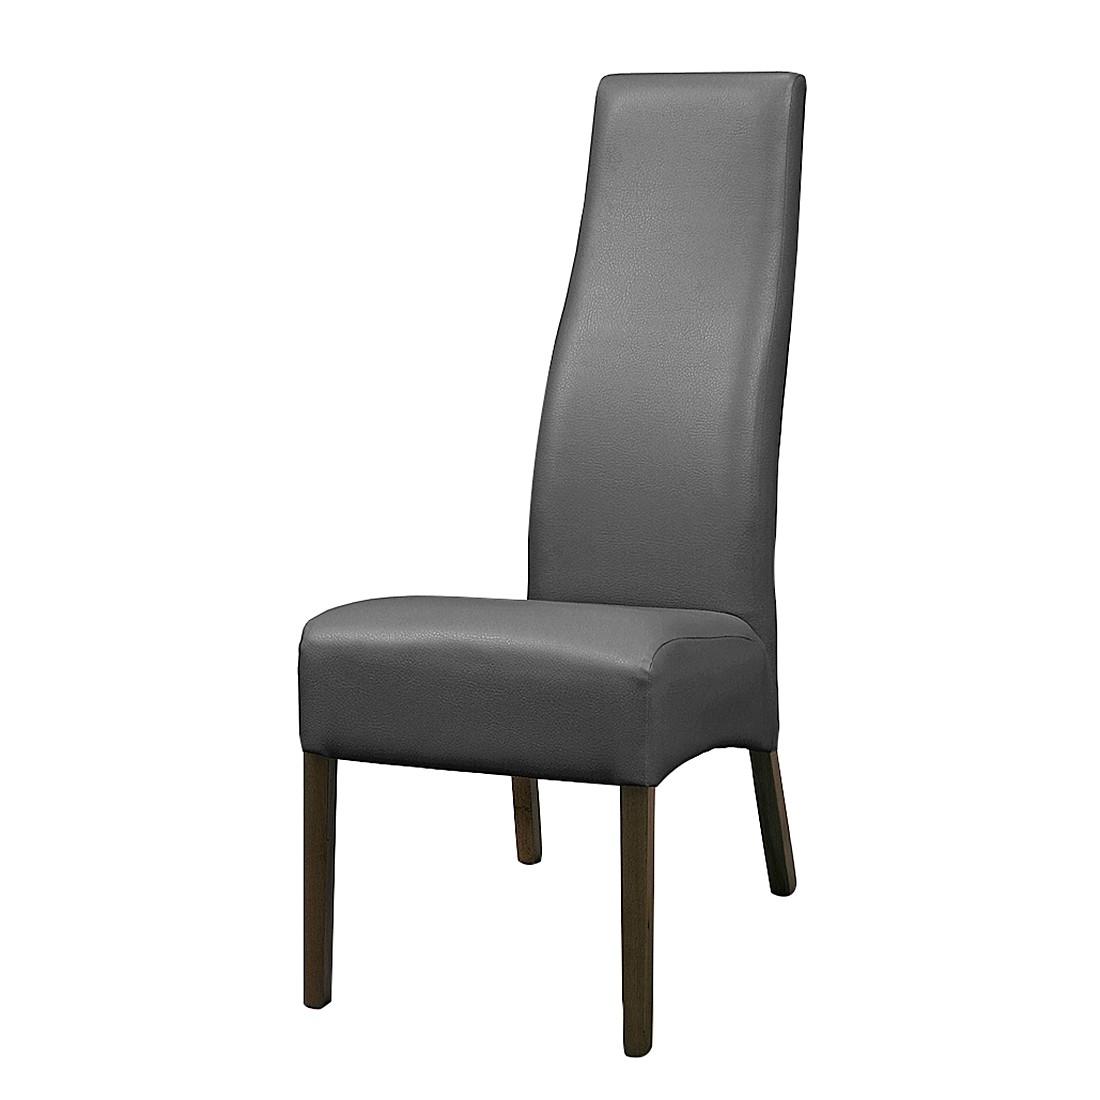 barhocker arik buche massiv kunstleder braun bellinzona g nstig. Black Bedroom Furniture Sets. Home Design Ideas